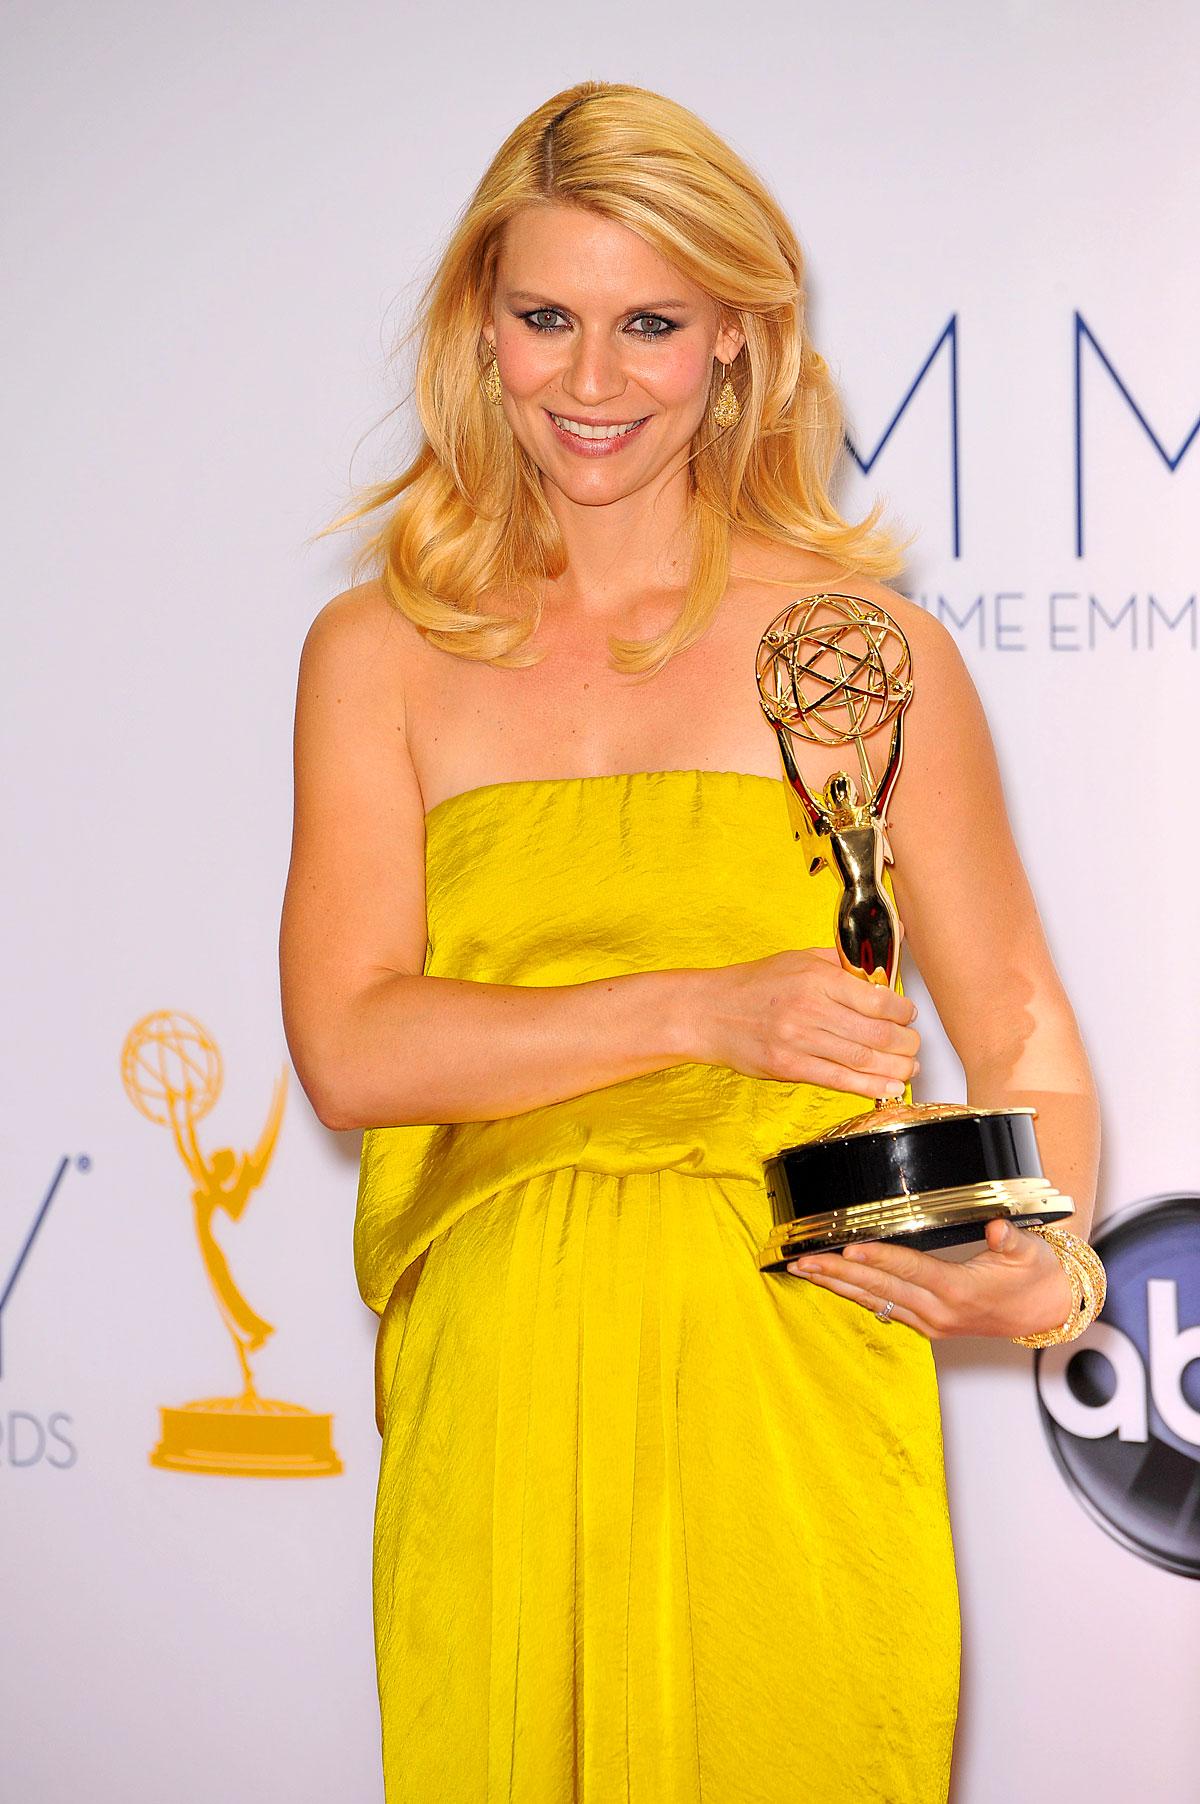 Claire Danes im September 2012 bei den 64. Emmy Awards